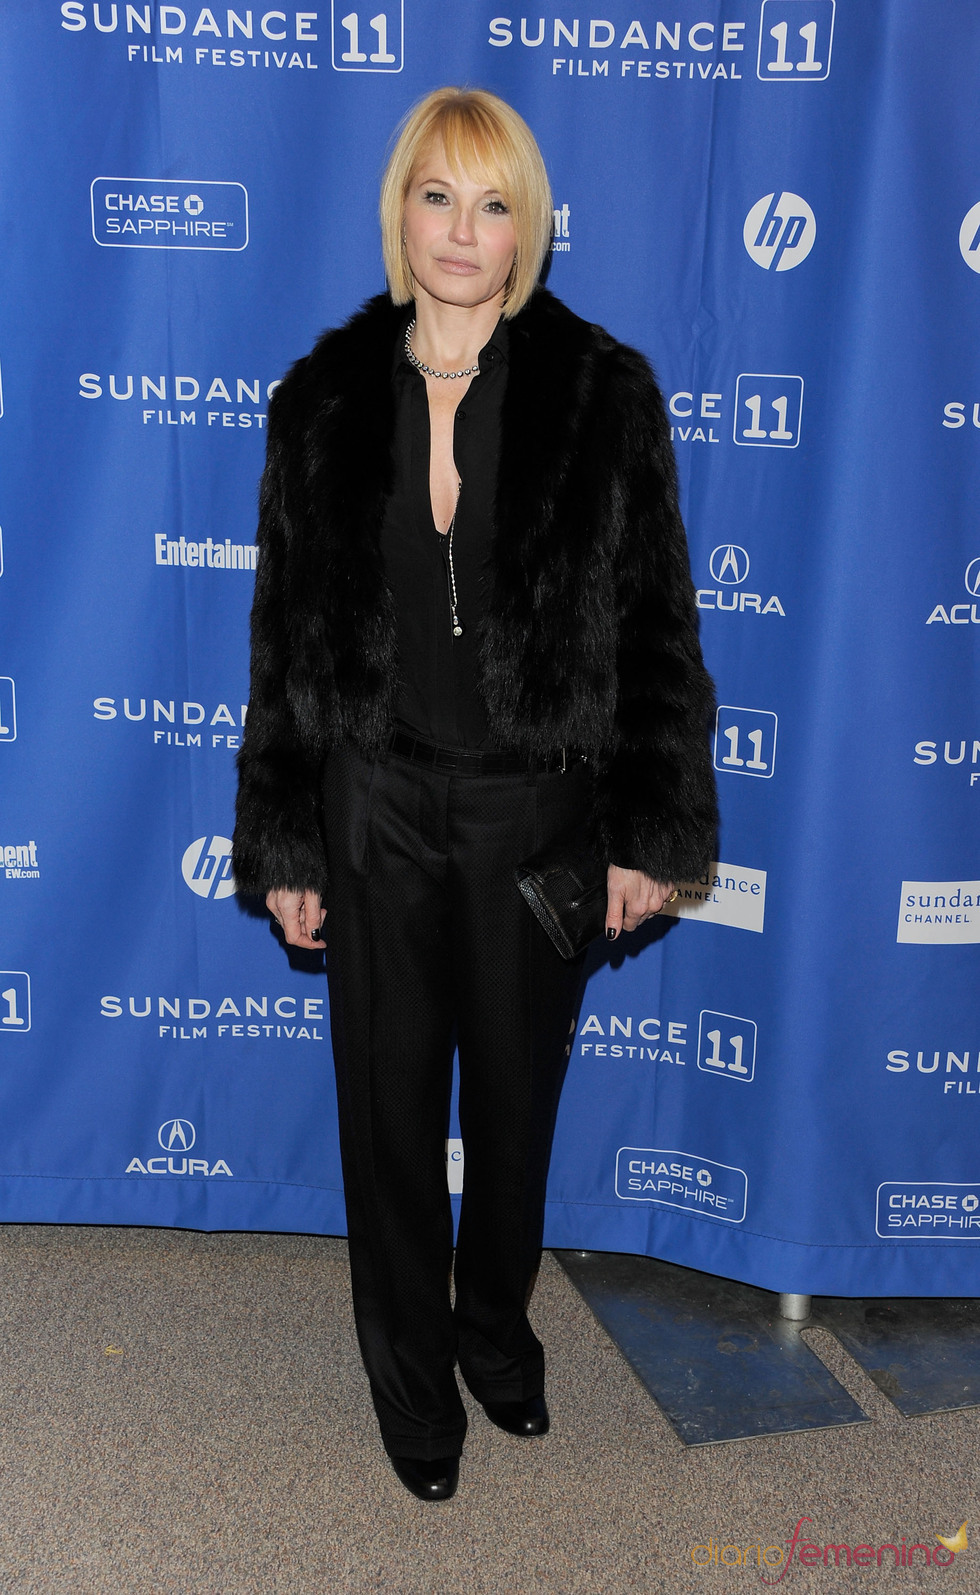 Ellen Barkin en el Festival de Cine Sundance 2011